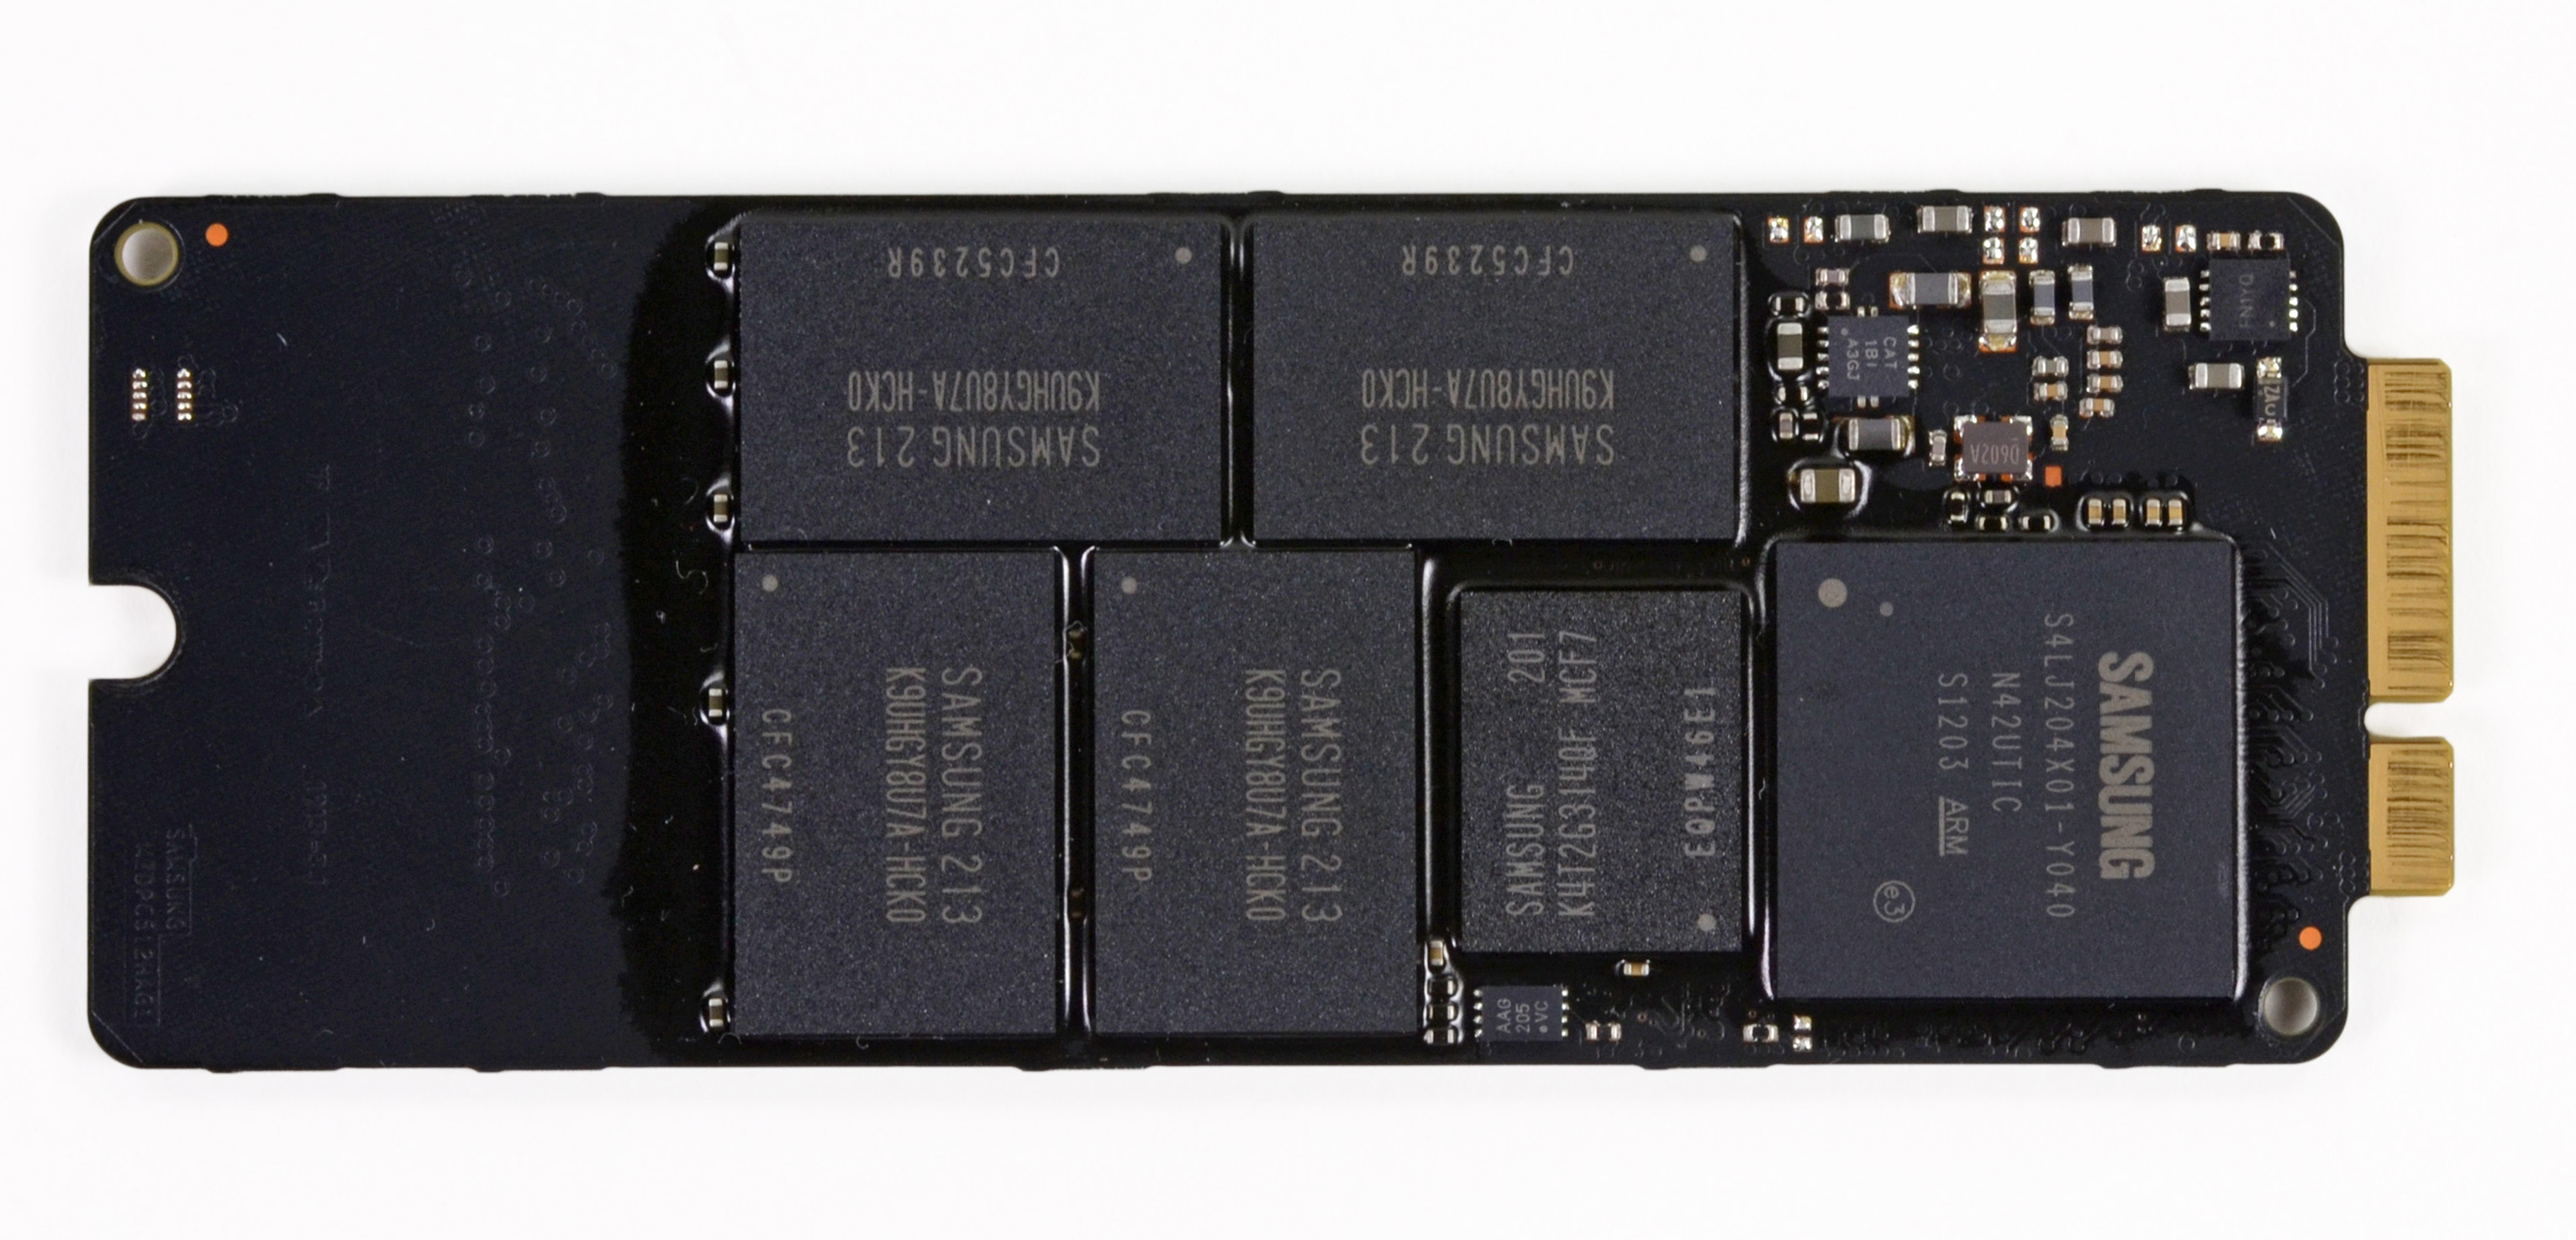 The Samsung PM830 based rMBP NAND flash storage card, image courtesy ...